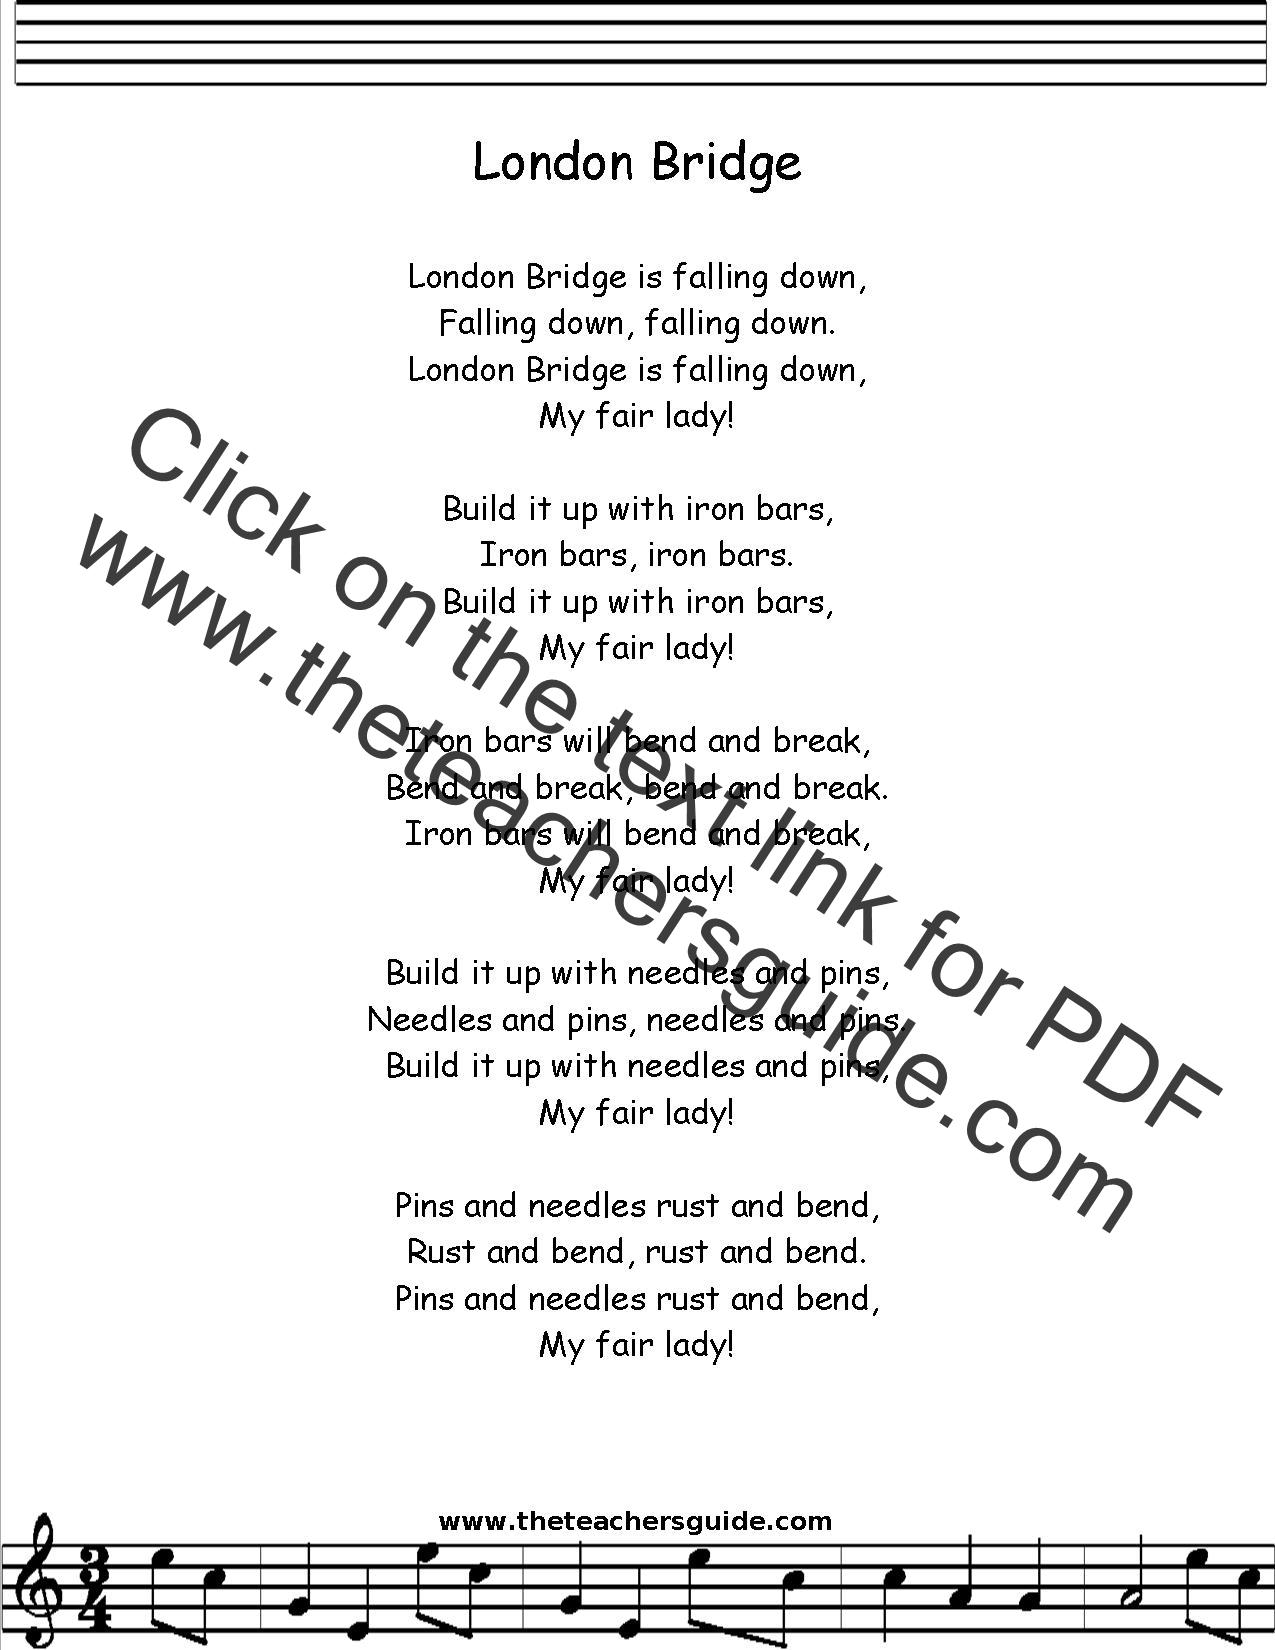 london bridge is falling down lyrics